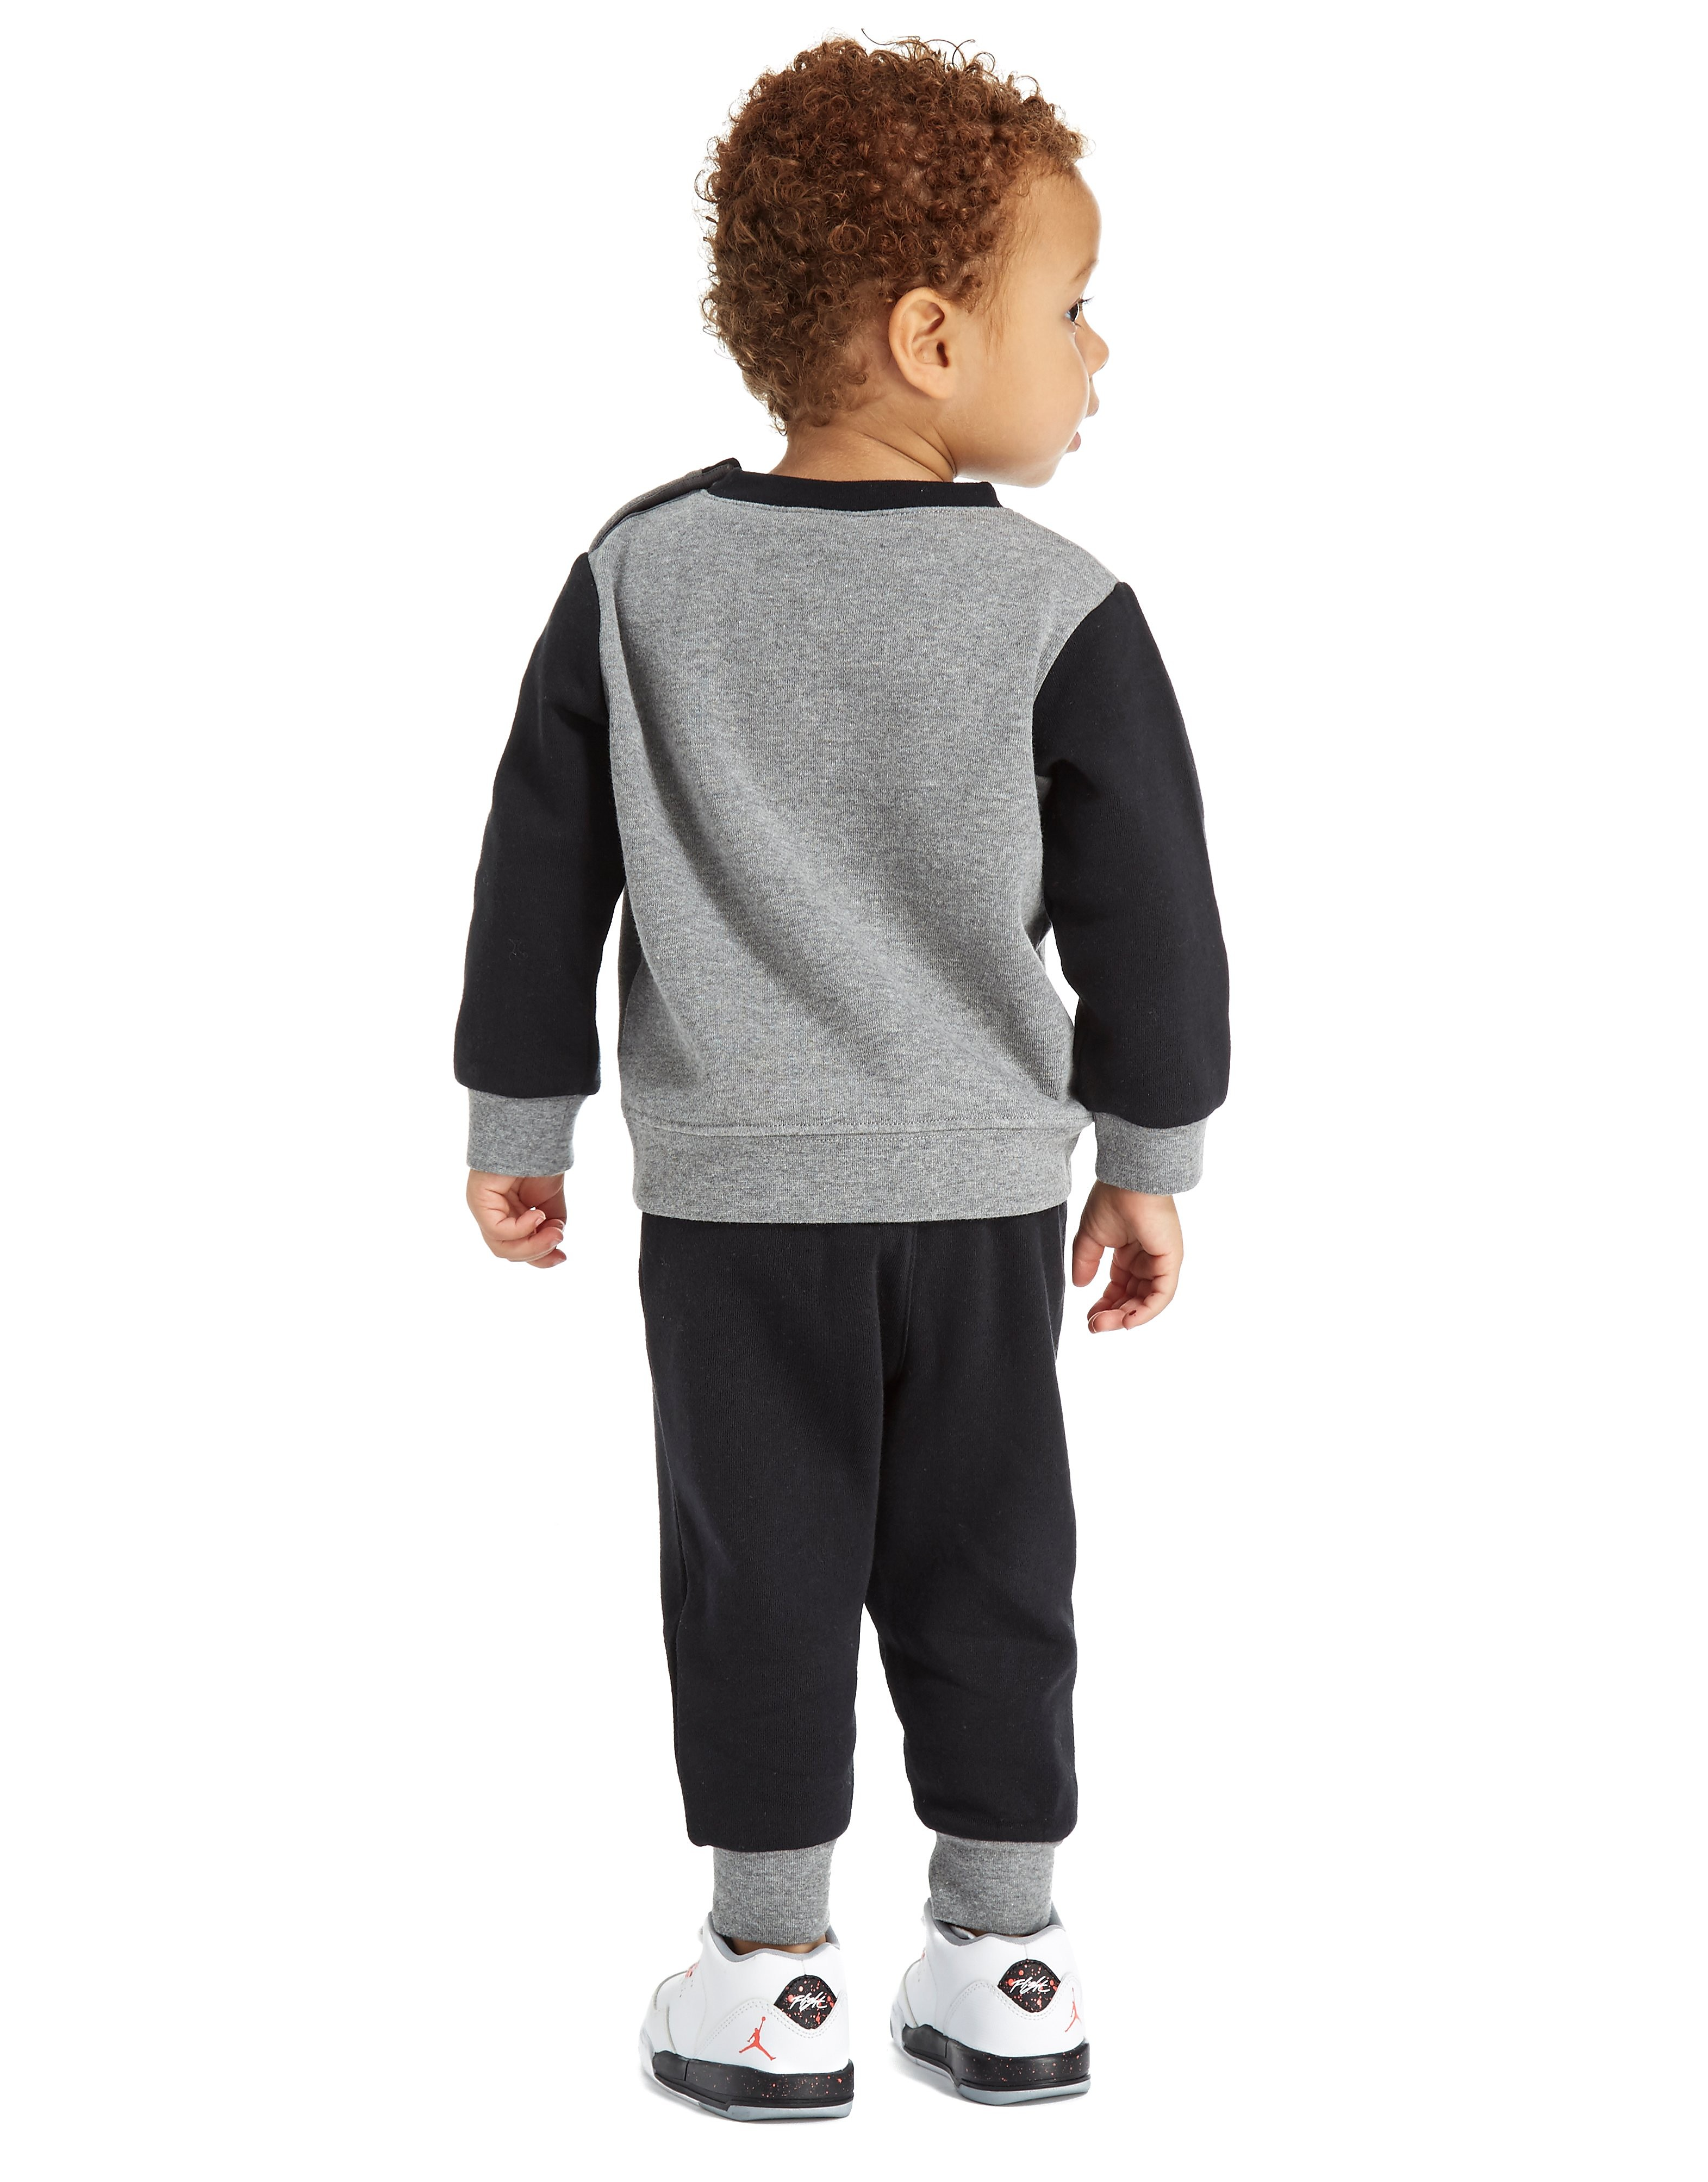 Jordan Jumpman Sweatshirt Suit Infant